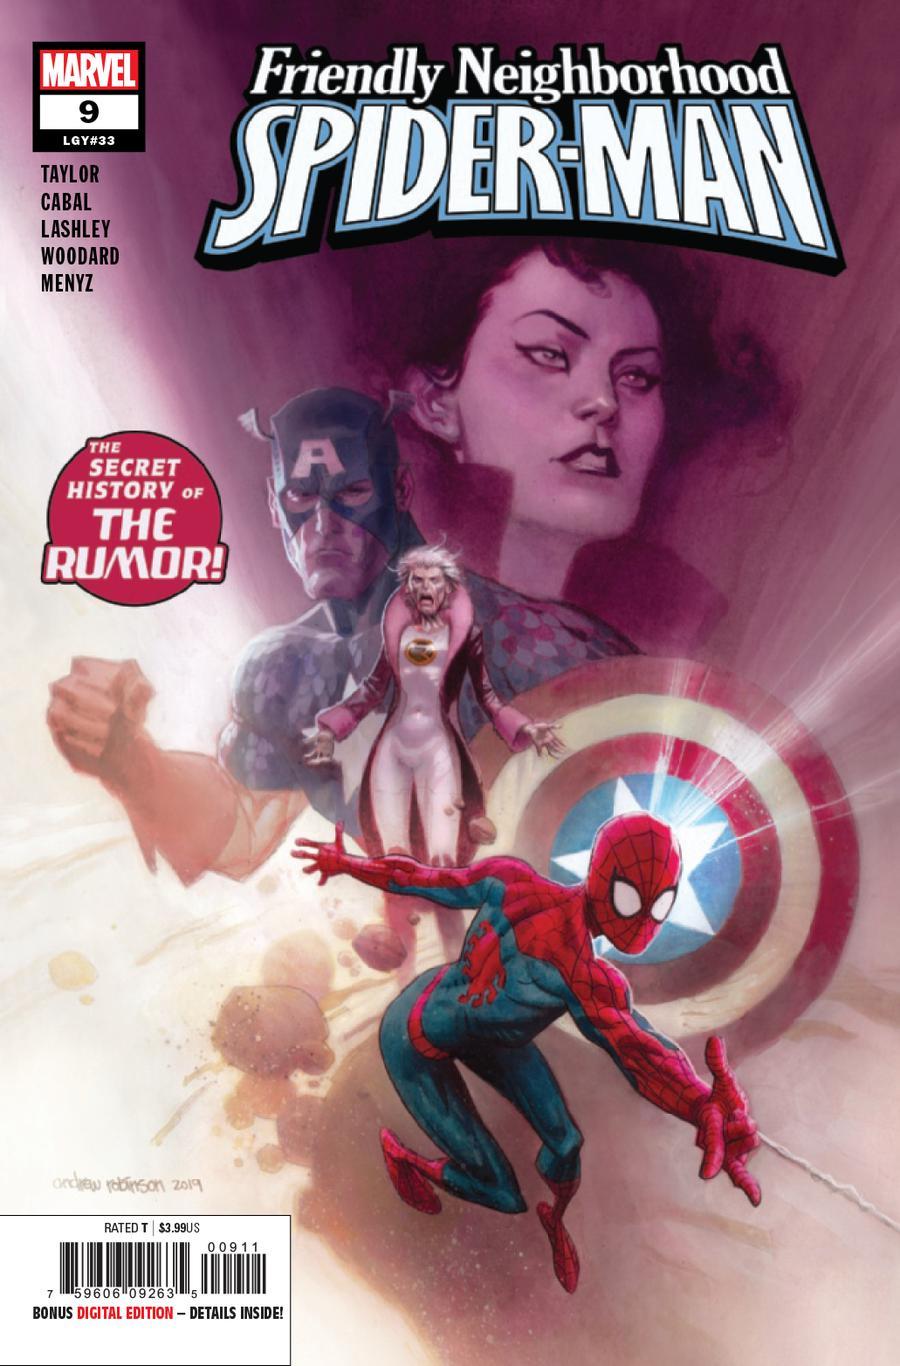 Friendly Neighborhood Spider-Man Vol 2 #9 Cover A Regular Andrew C Robinson Cover